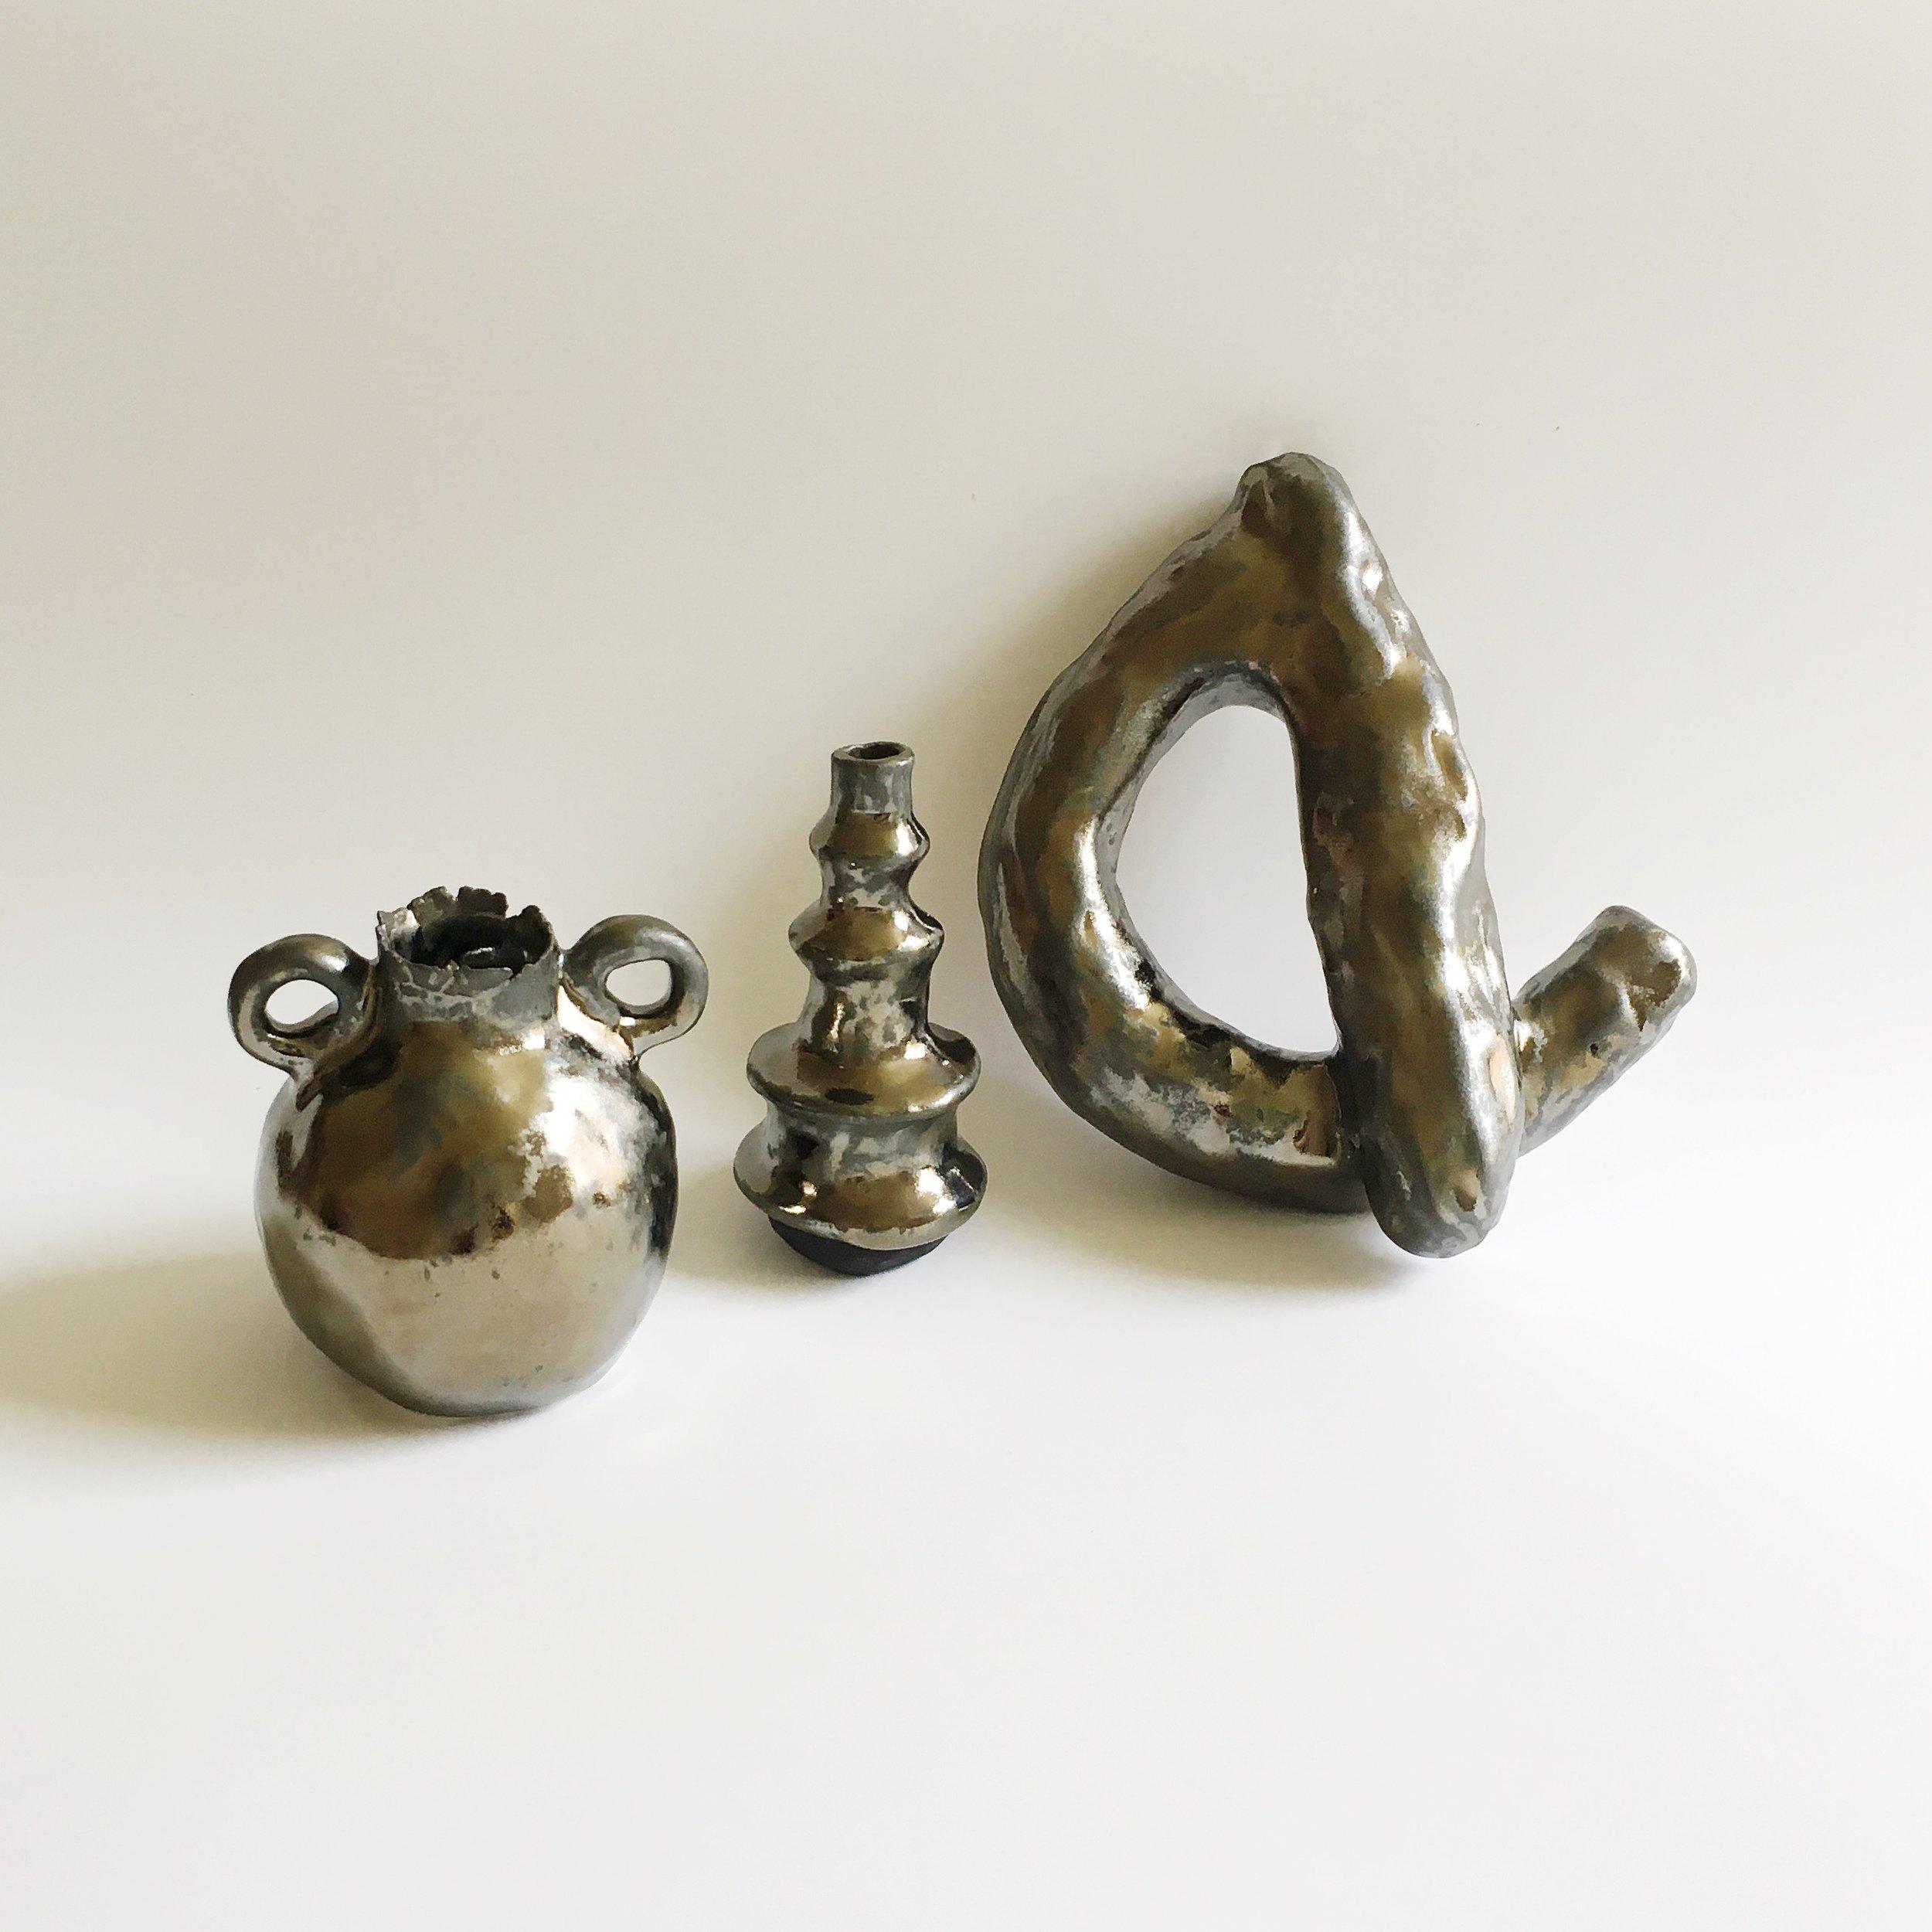 Metallic Vessels and Sculpture, 2016